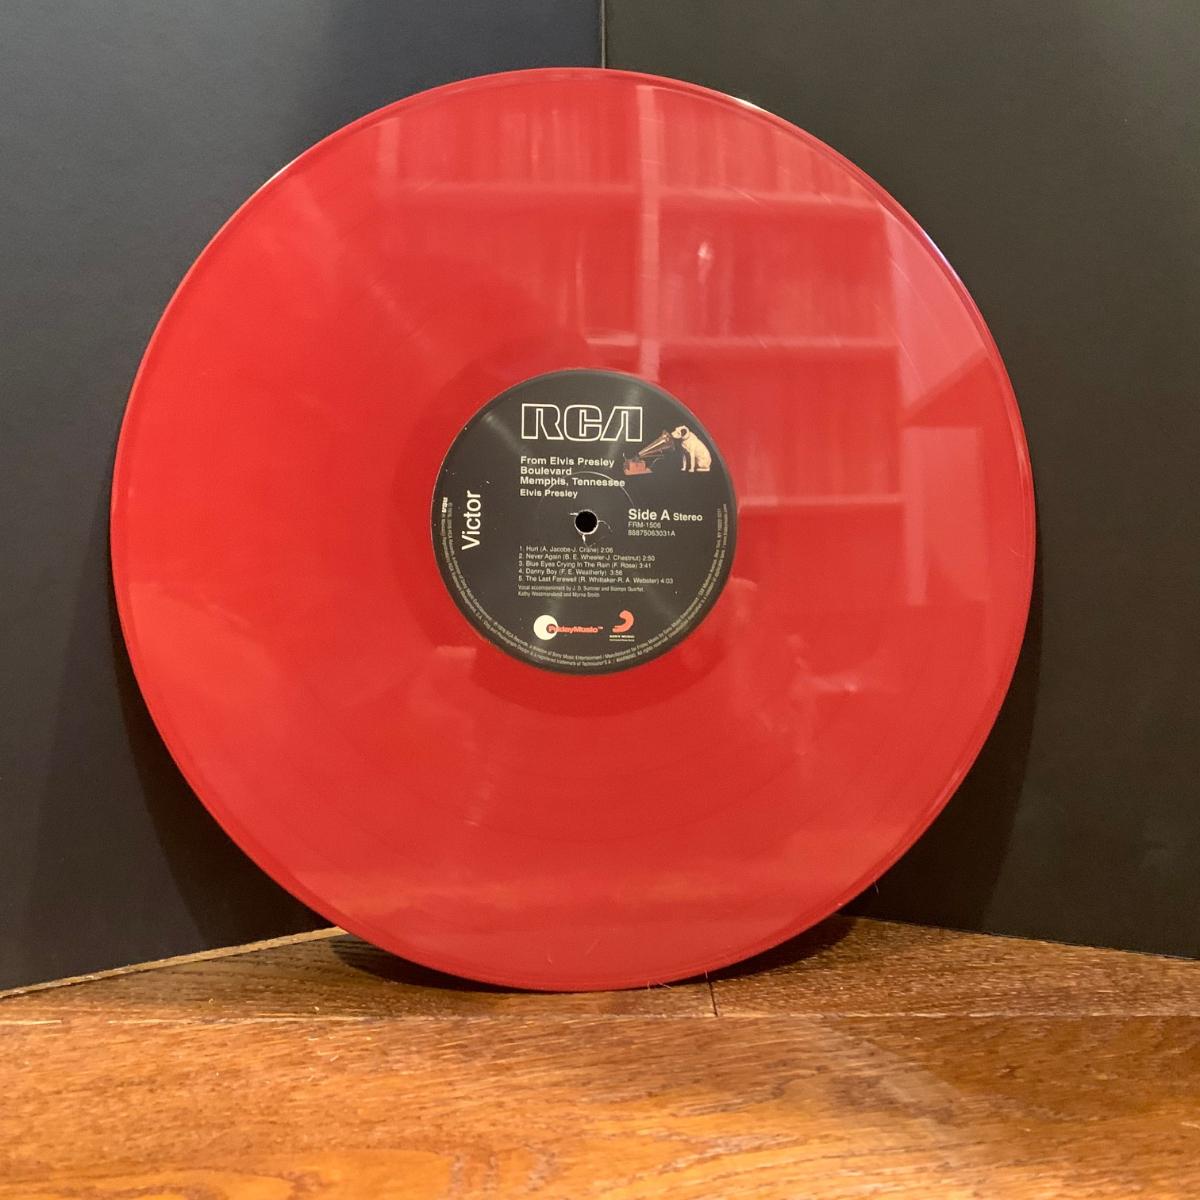 Elvis Presley From Elvis Presley Boulevard Memphis Tennesee (180 Gram Audiophile Burgundy Red Vinyl/Limited Edition/Gatefold Cover)